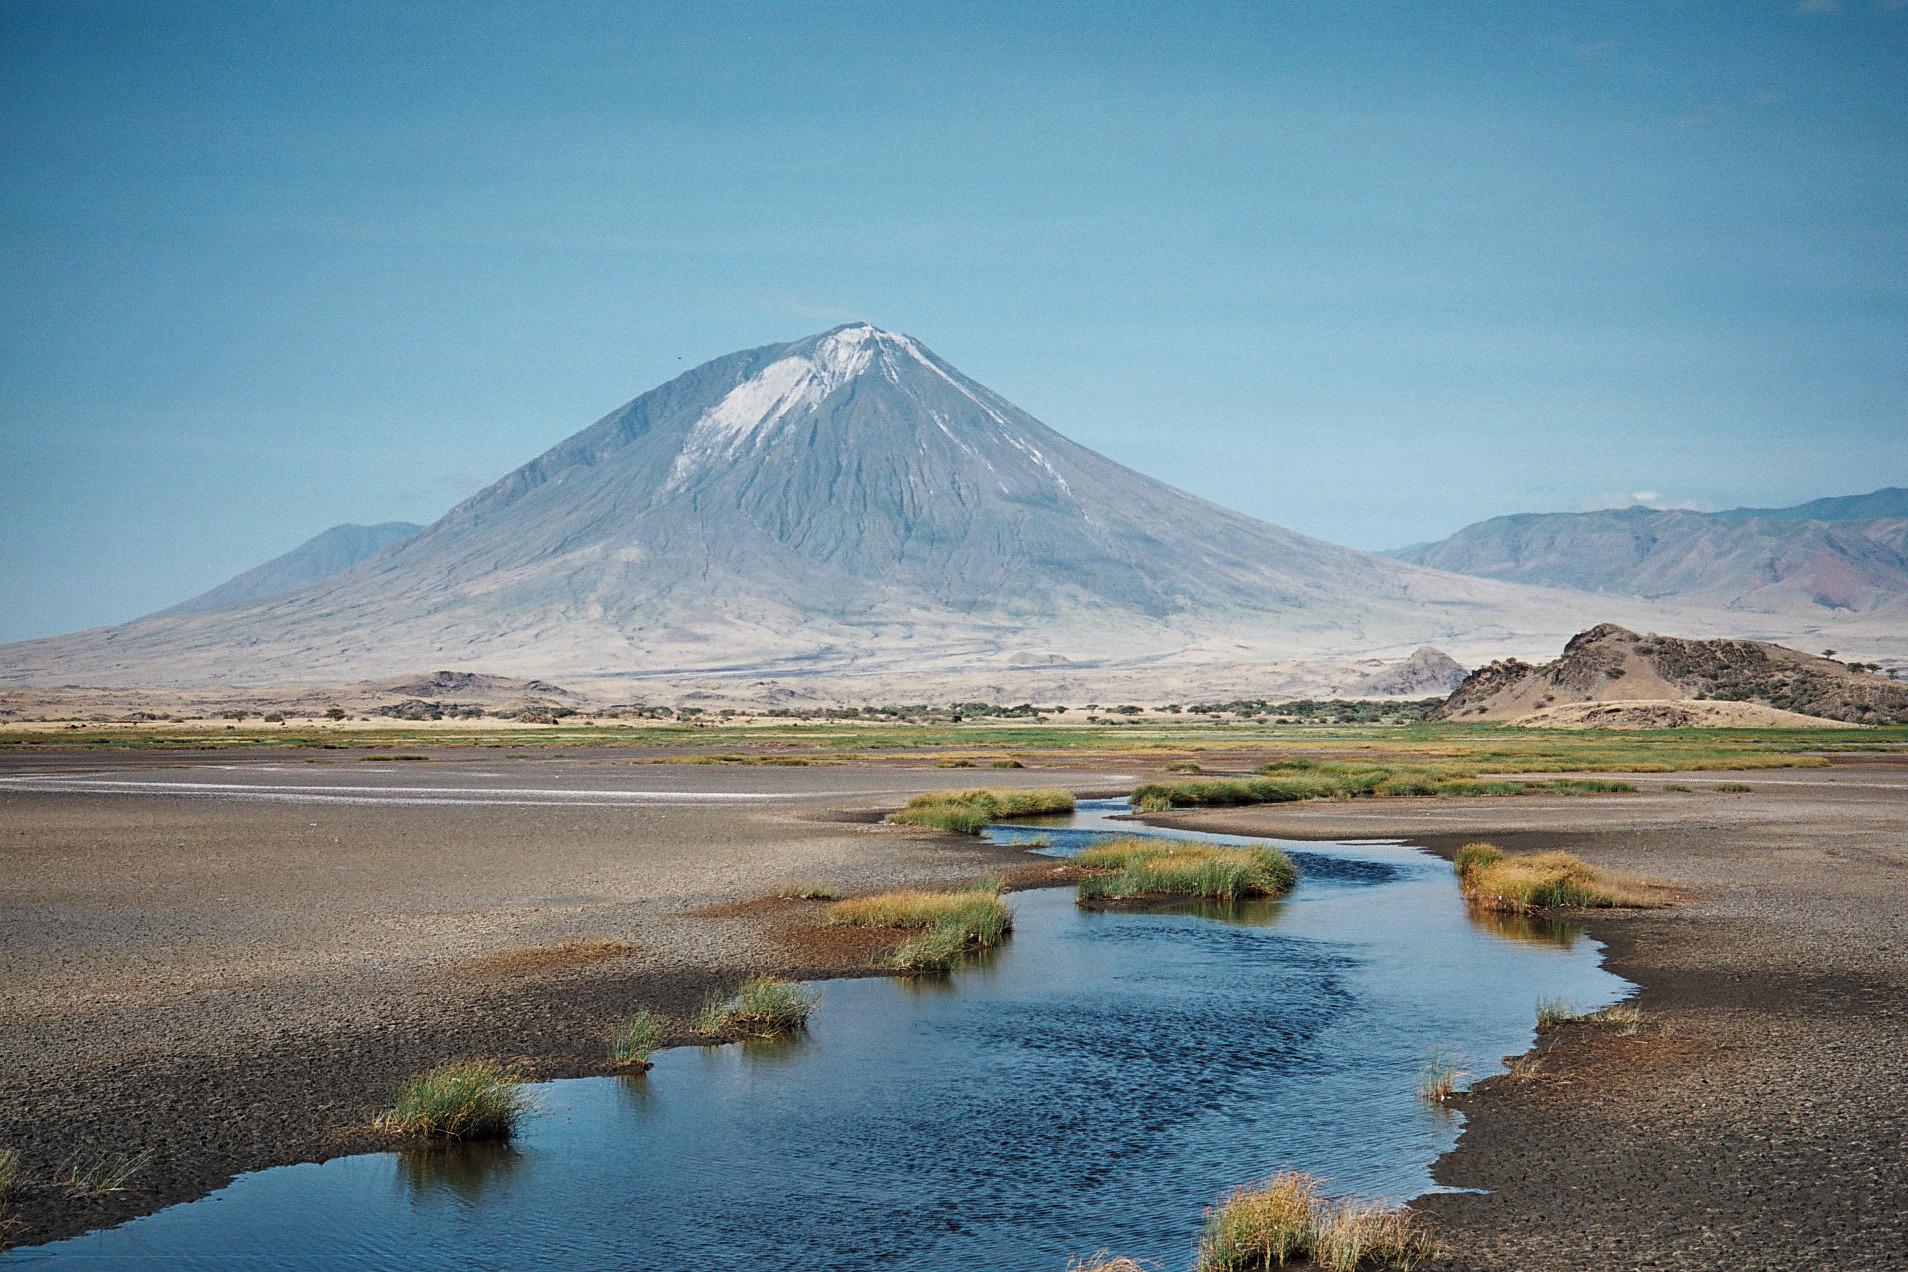 Mount Ol doinyo Lengai